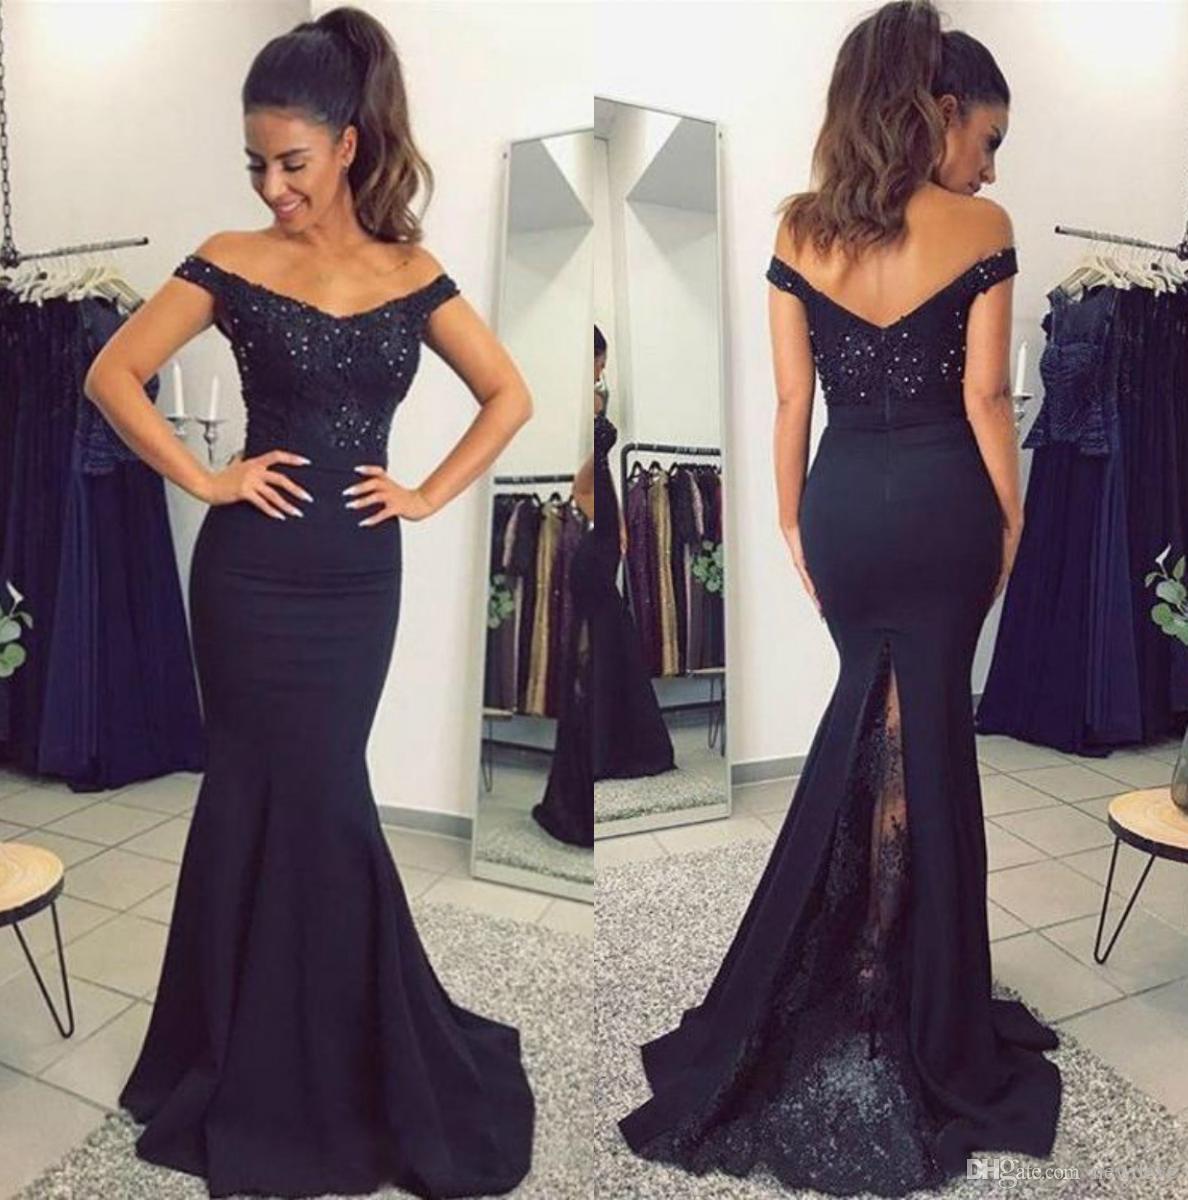 a40901b17c 2018 New Bead Mermaid Formal Dresses Black Long Prom Dress Sheath Off The  Shoulder Lace Evening Gowns Best Prom Dresses Blue Prom Dress From Newdeve,  ...